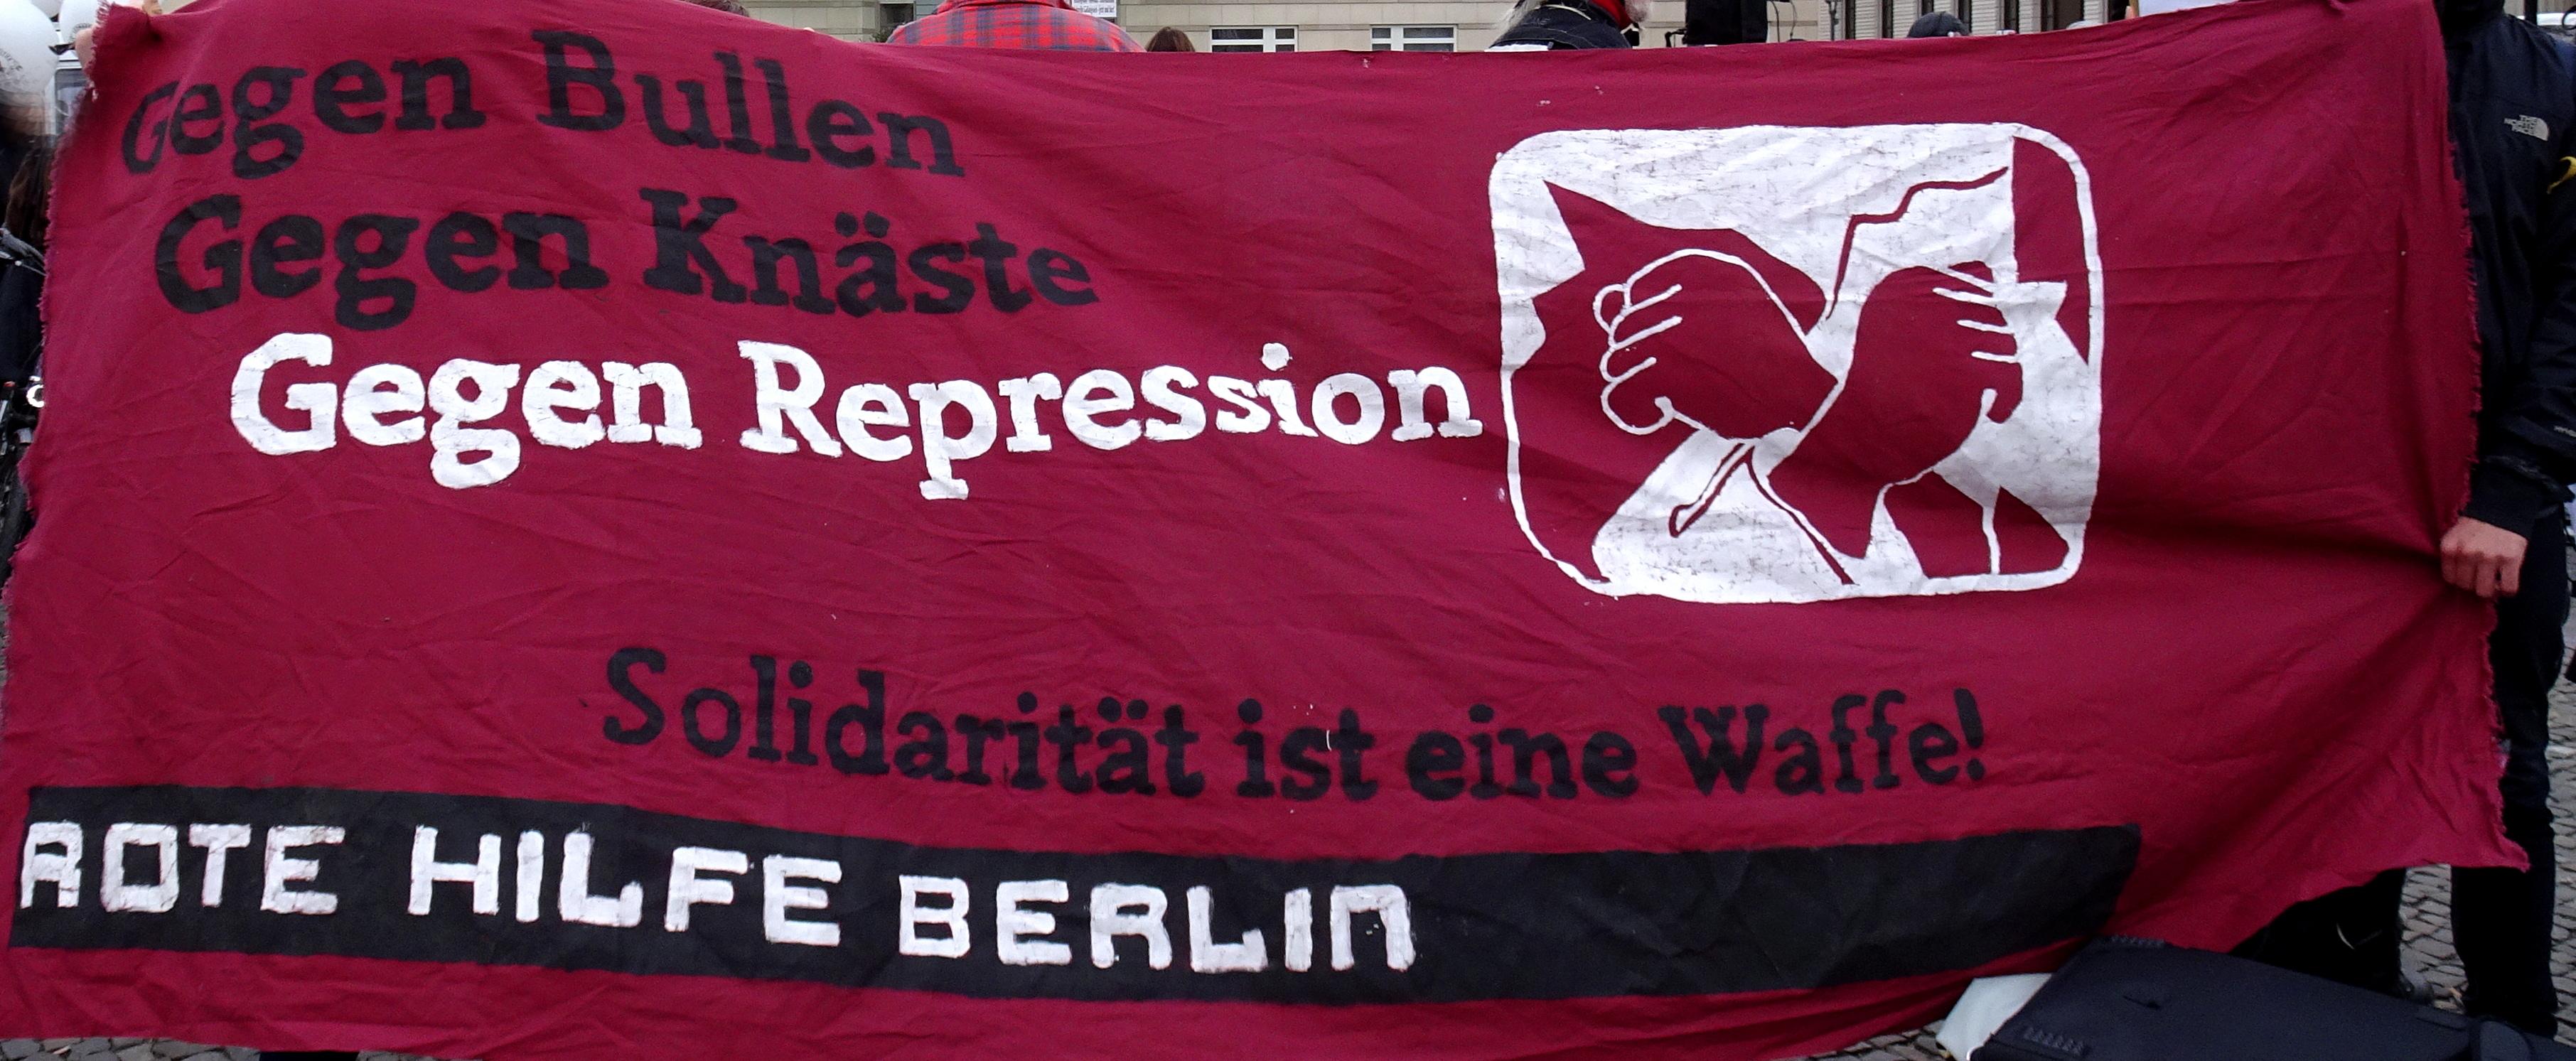 RH - gegen Repression